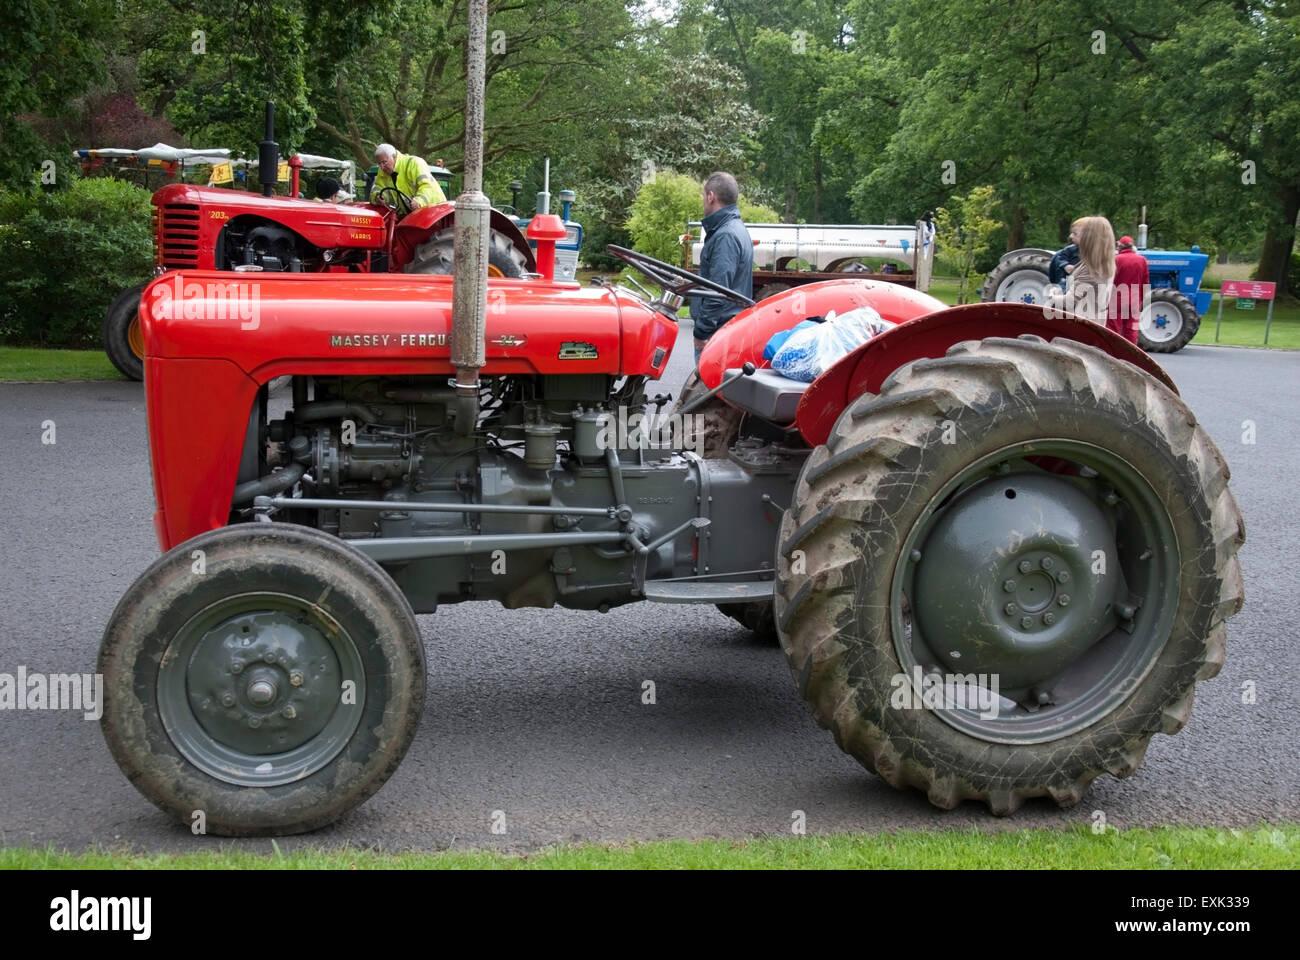 Massey Ferguson Model 35 : Red massey ferguson model farm tractor stock photo